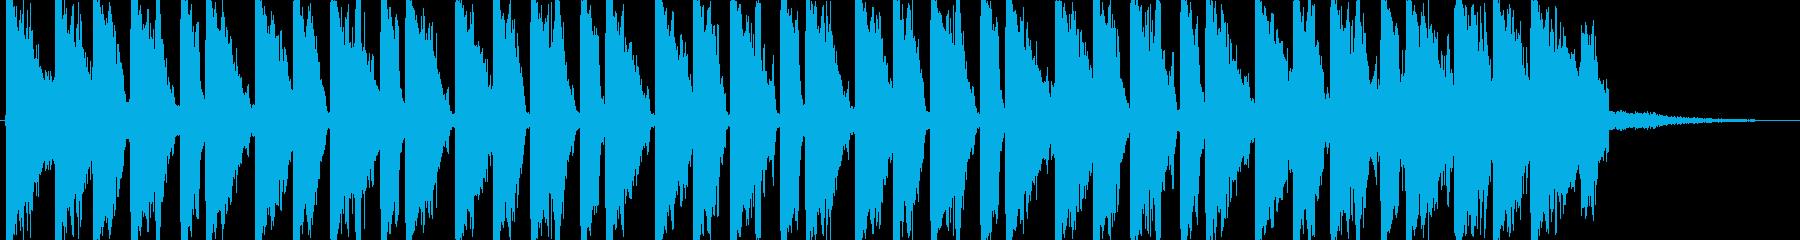 EDM・オシャレ・クラブ系・ジングルの再生済みの波形